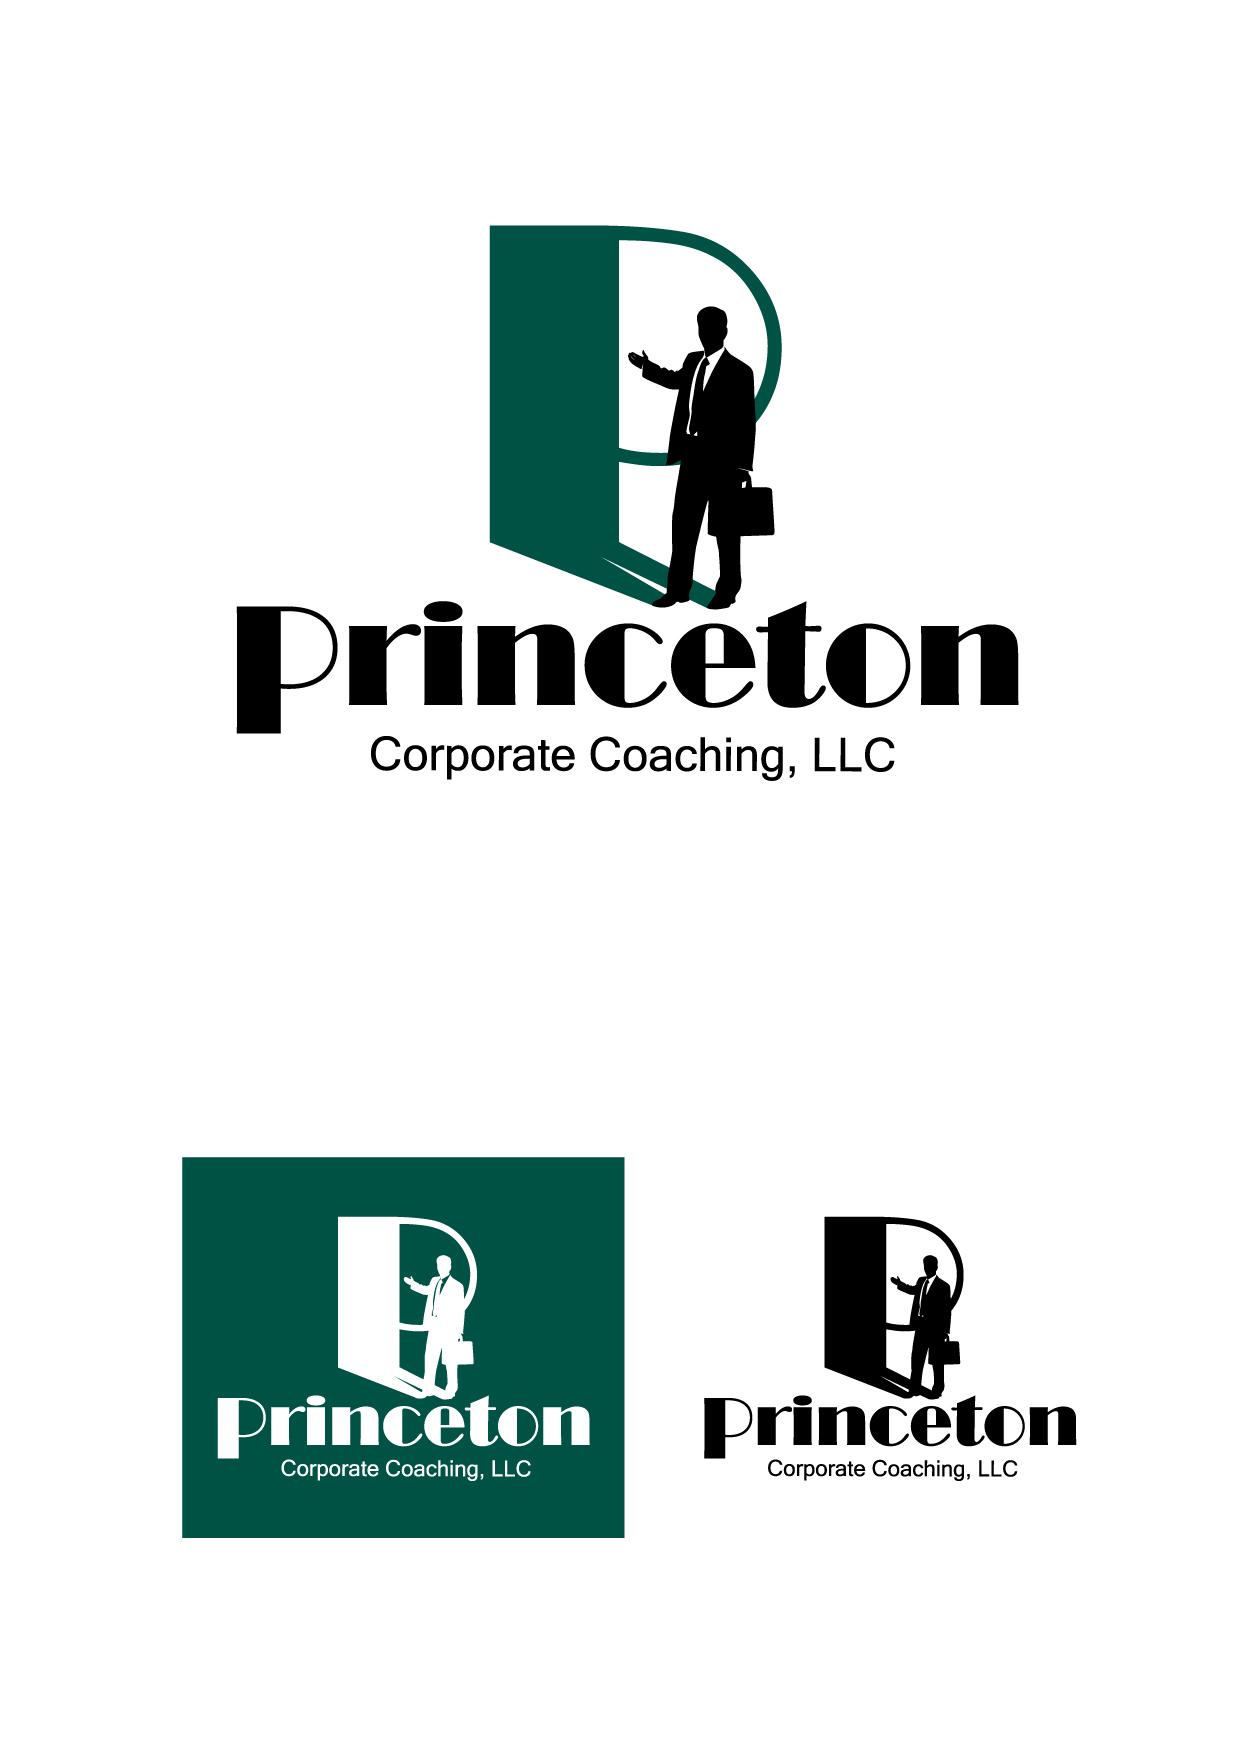 Logo Design by Wilfredo Mendoza - Entry No. 53 in the Logo Design Contest Unique Logo Design Wanted for Princeton Corporate Coaching, LLC.